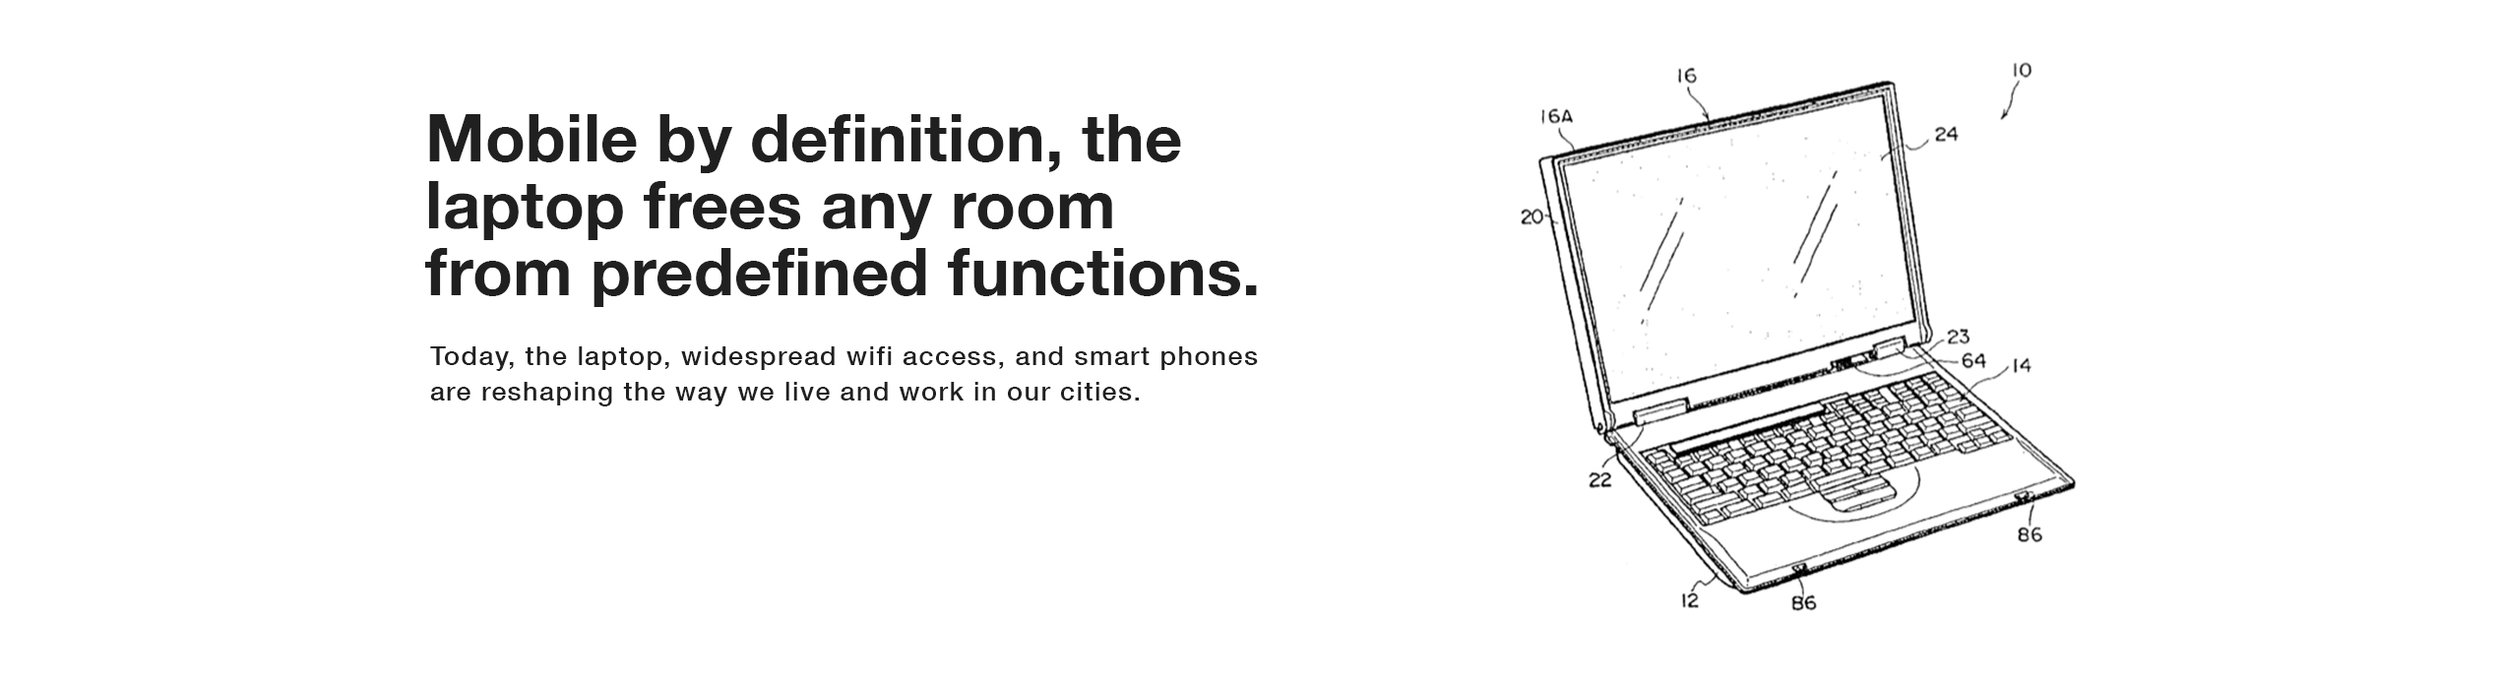 Cutwork, Elevator vs Laptop, 4C.jpg